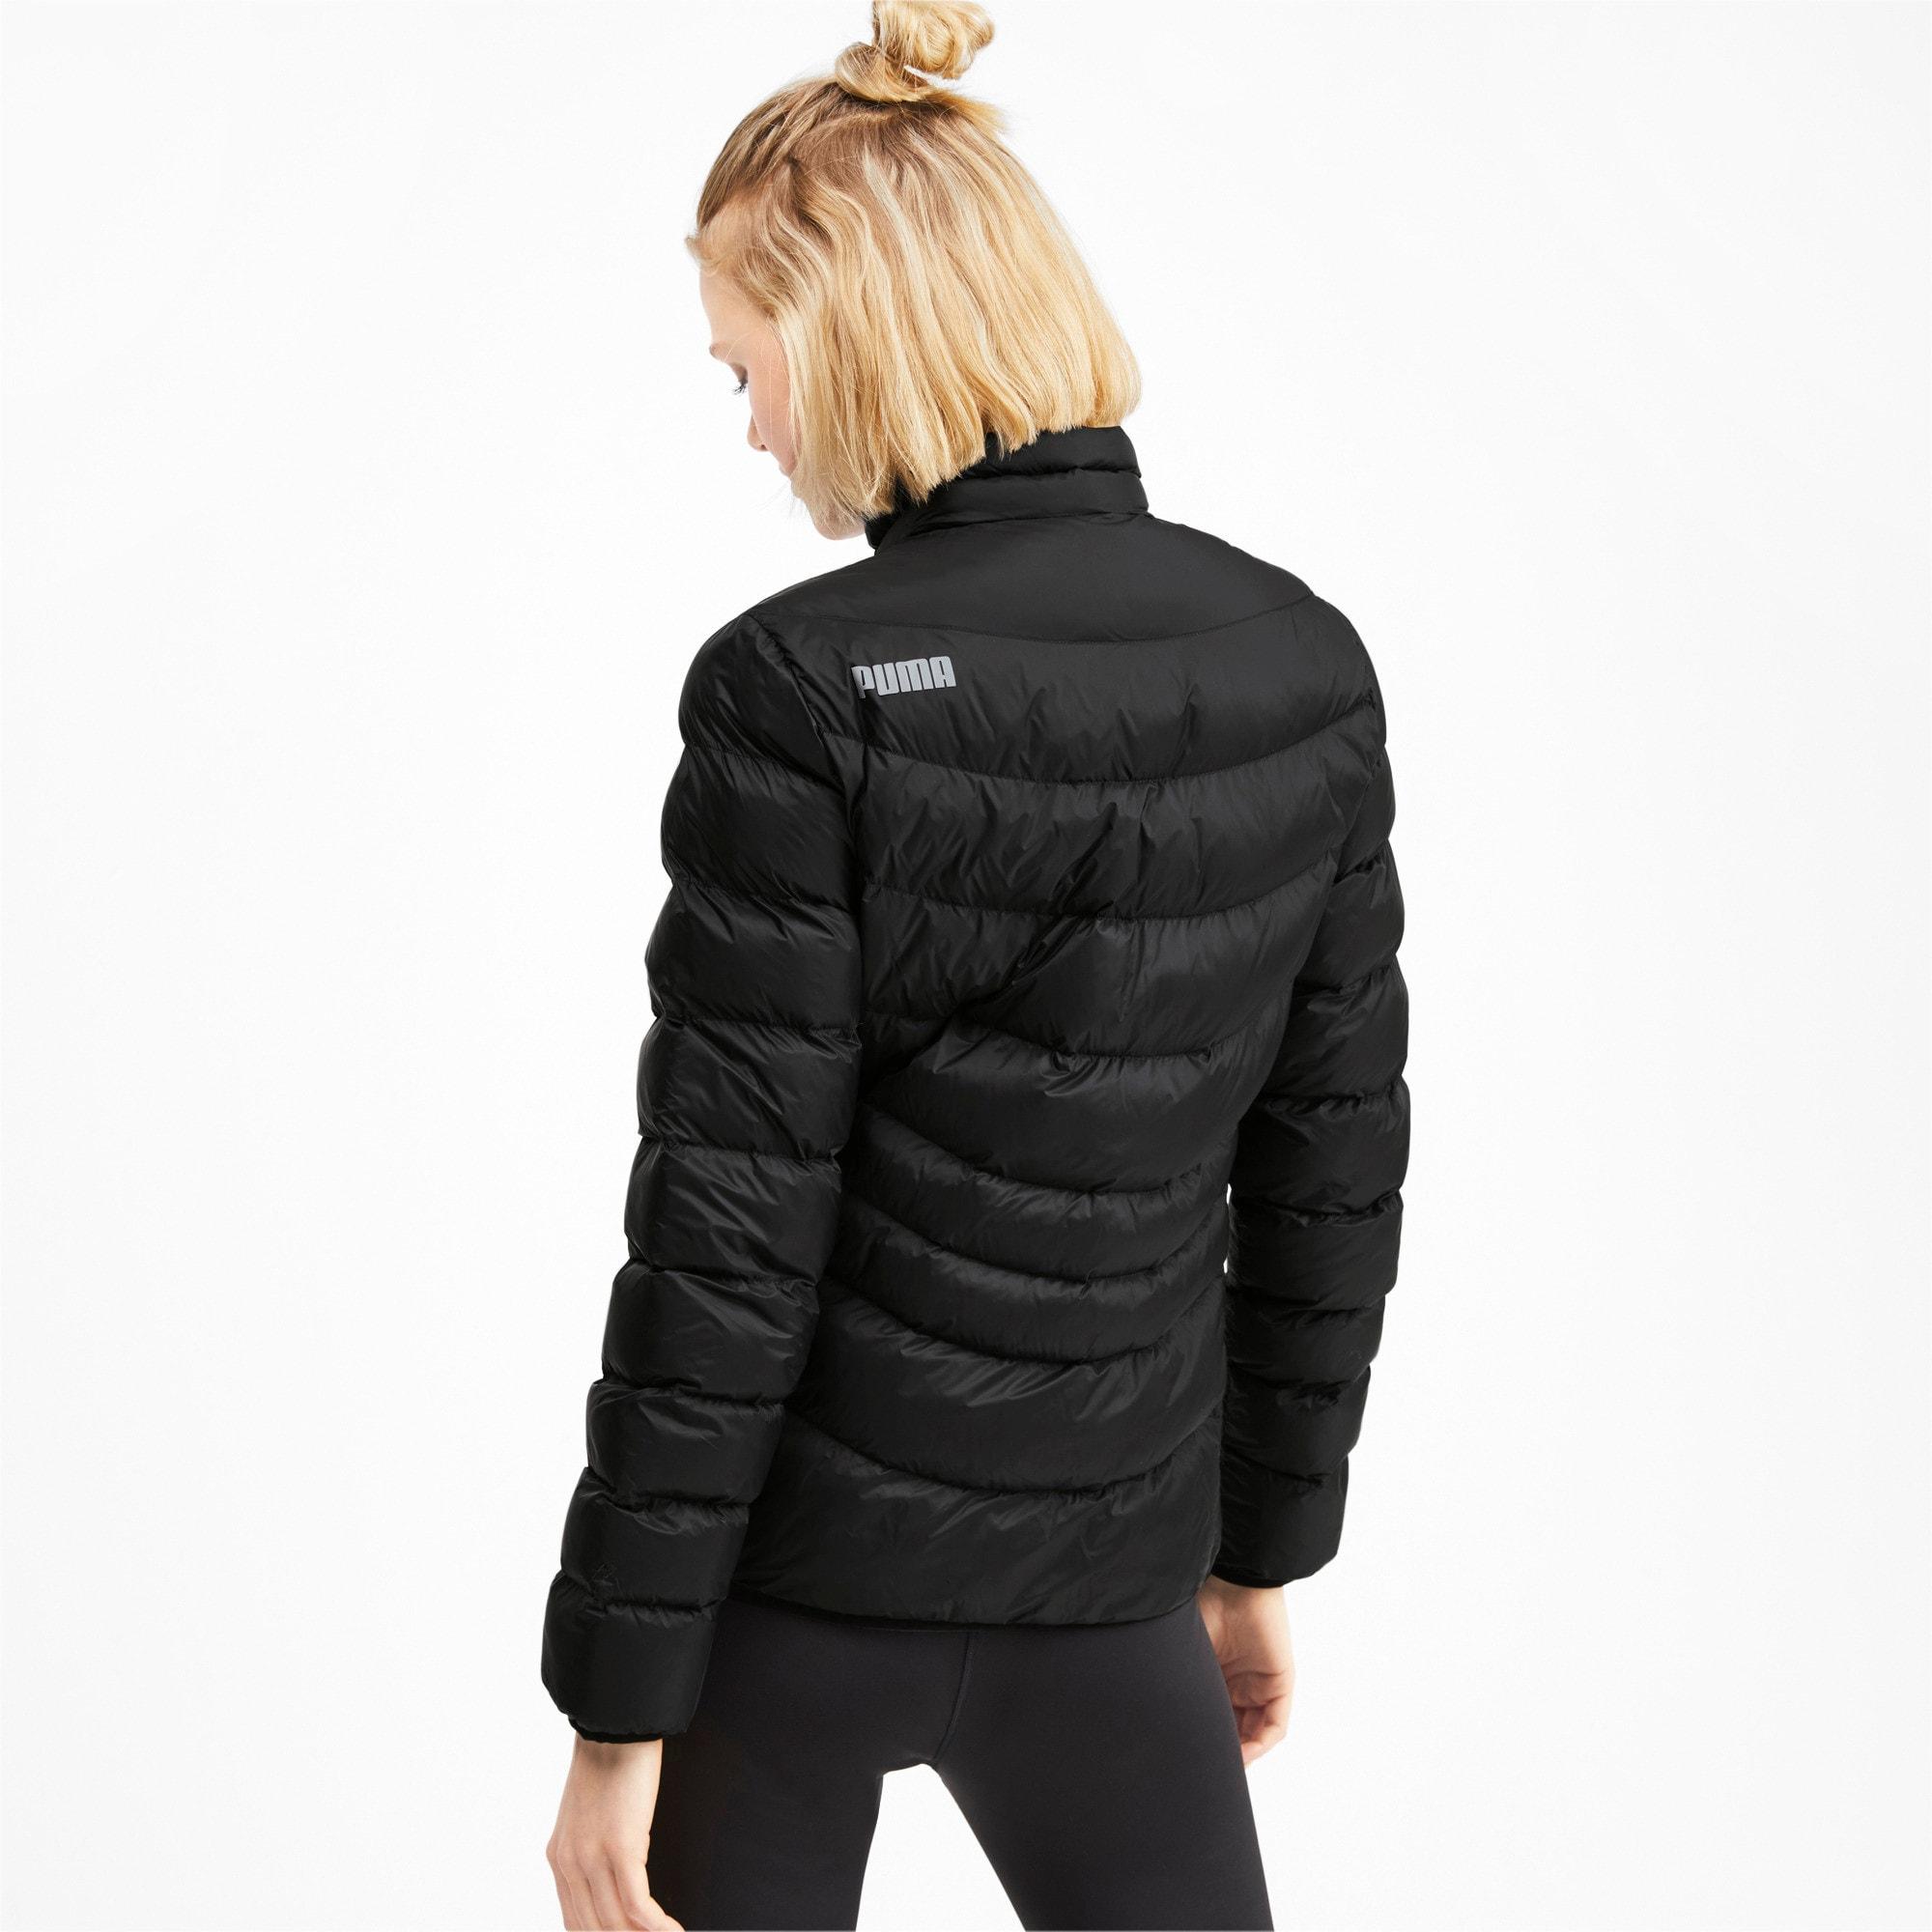 Thumbnail 2 of Ultralight warmCELL Women's Jacket, Puma Black, medium